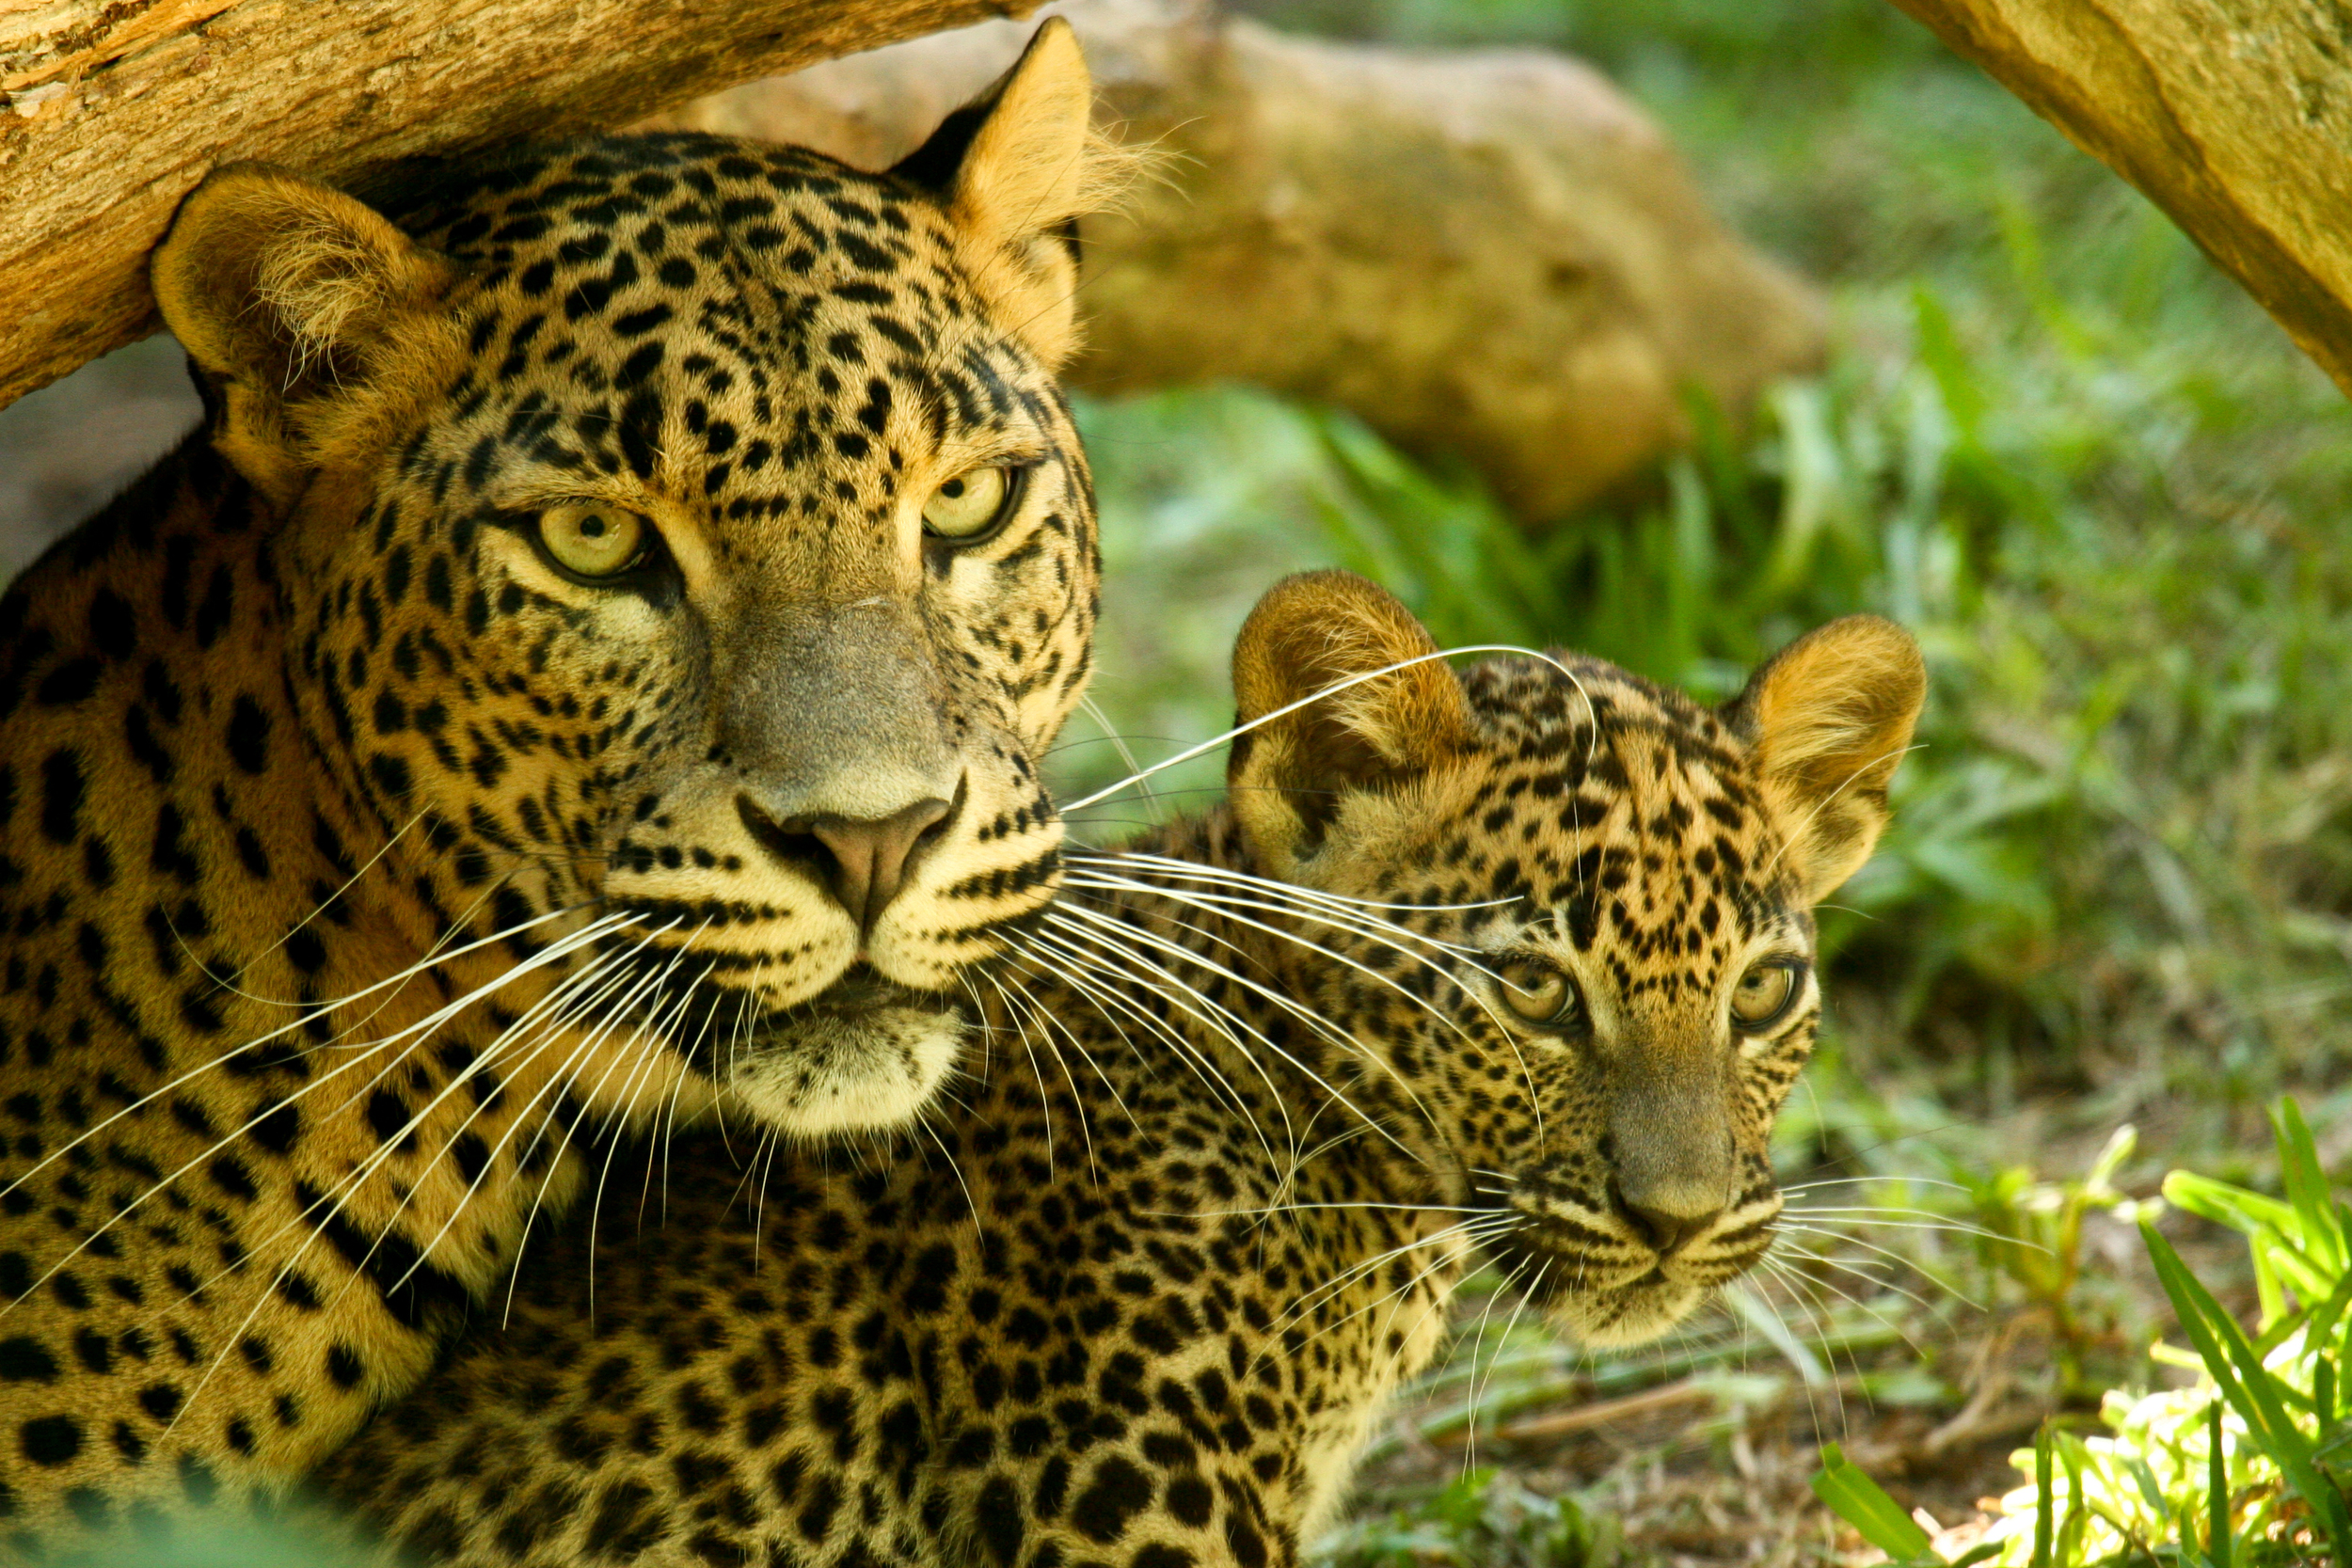 Trek wild leopard on a national park safari